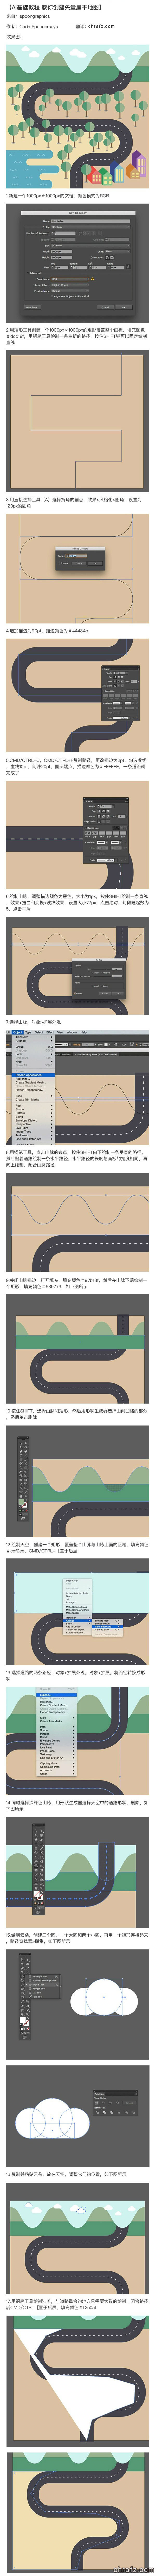 chrafz教你创建矢量扁平地图-AI设计教程-张弦先生-chrafz.com